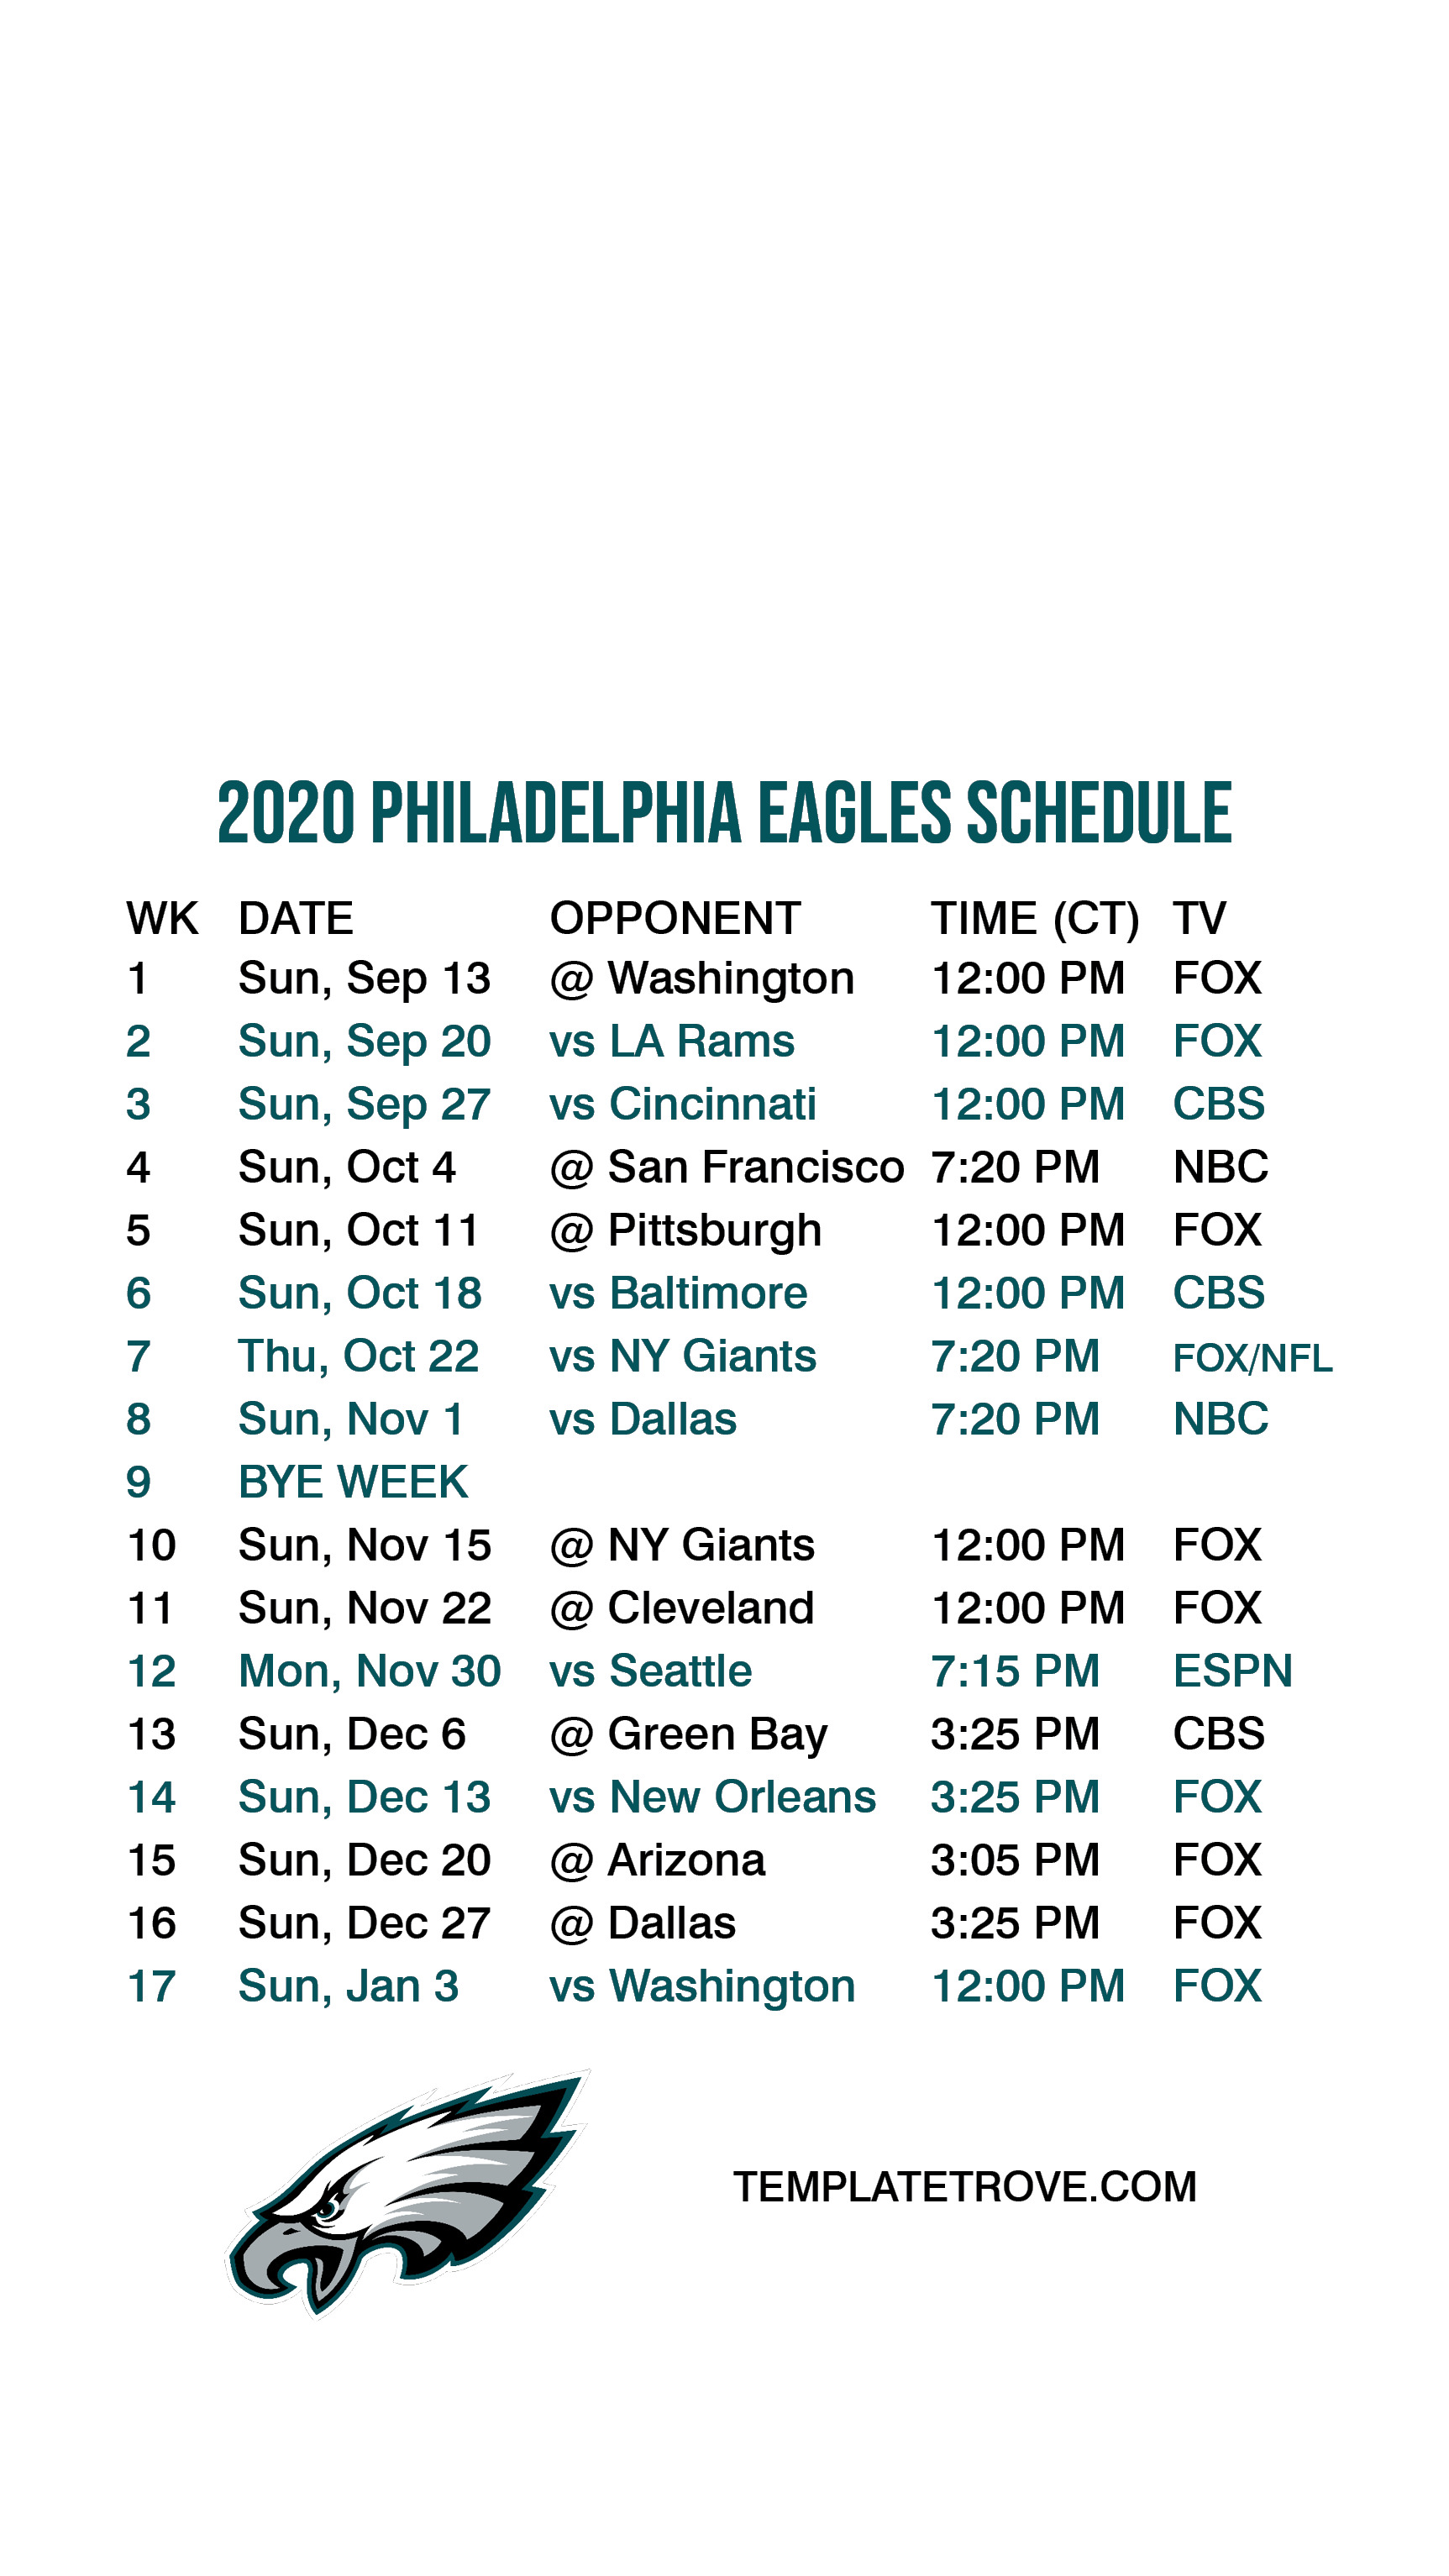 2020 2021 Philadelphia Eagles Lock Screen Schedule For